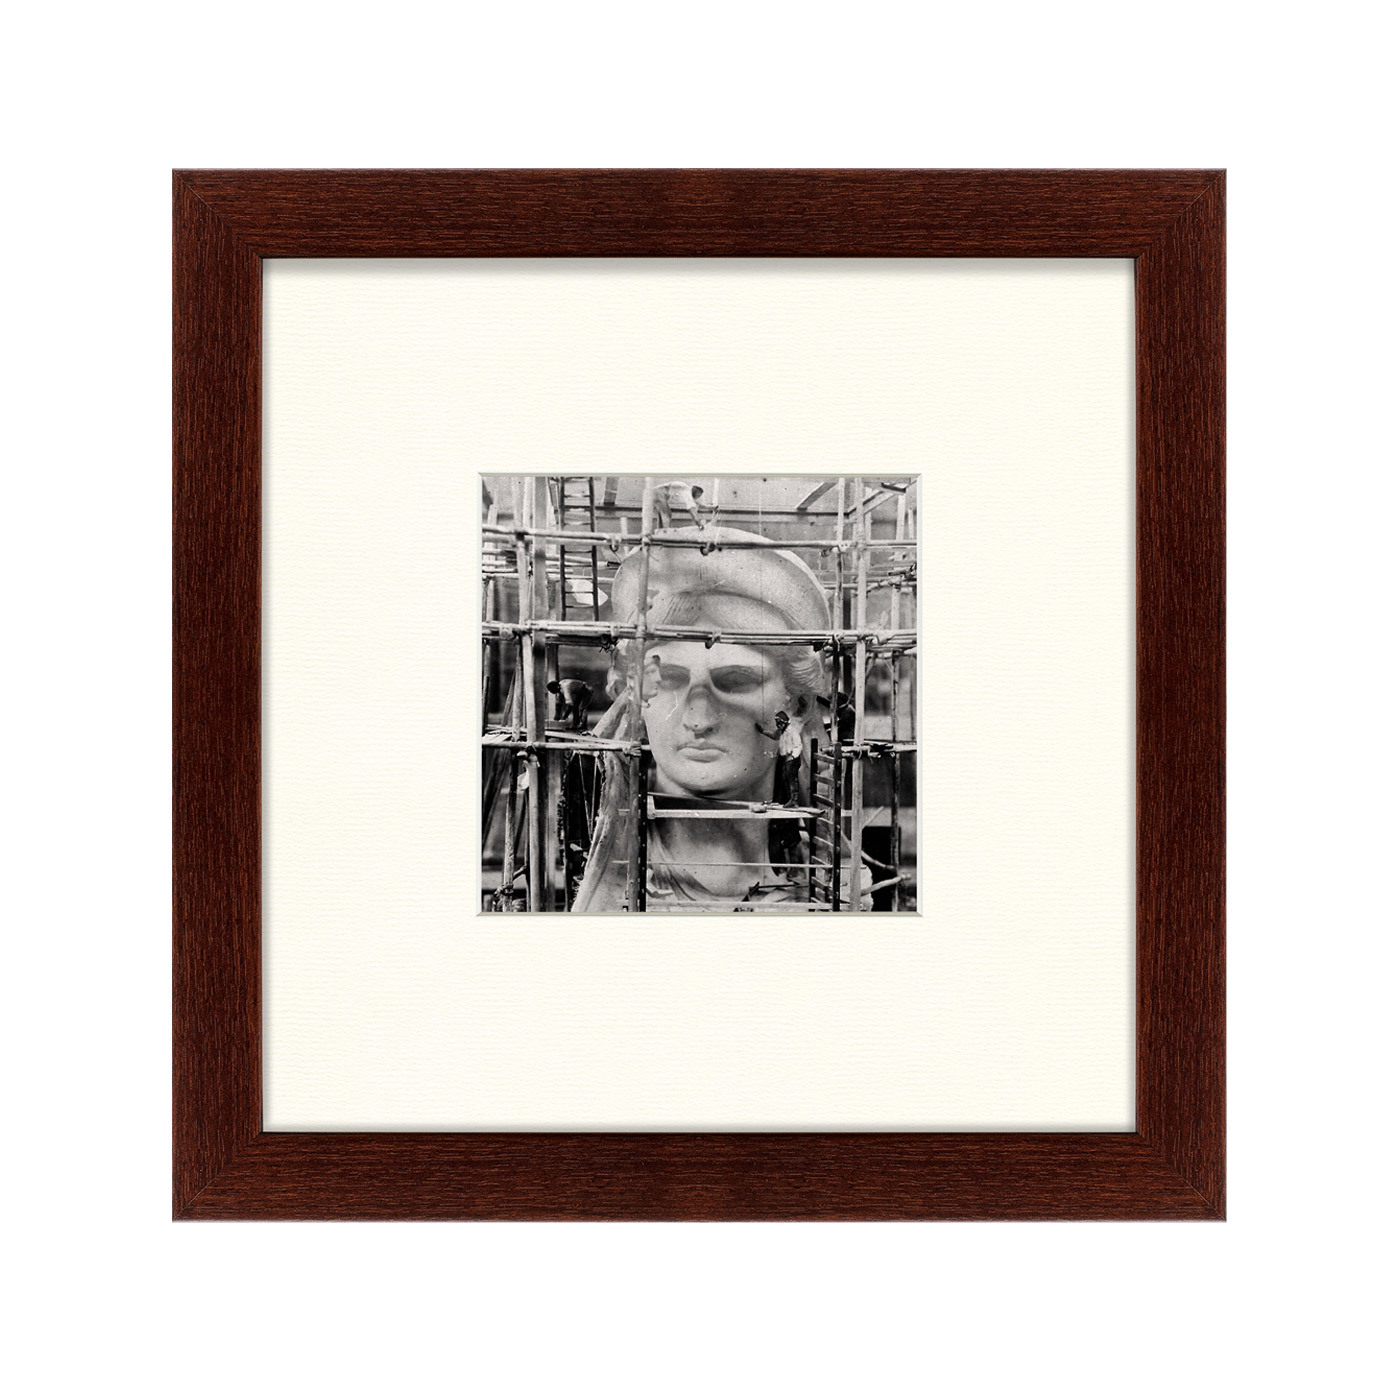 {} Картины в Квартиру Картина Строительство Статуи Свободы (35х35 см) картины в квартиру картина on the seine no 2 35х35 см